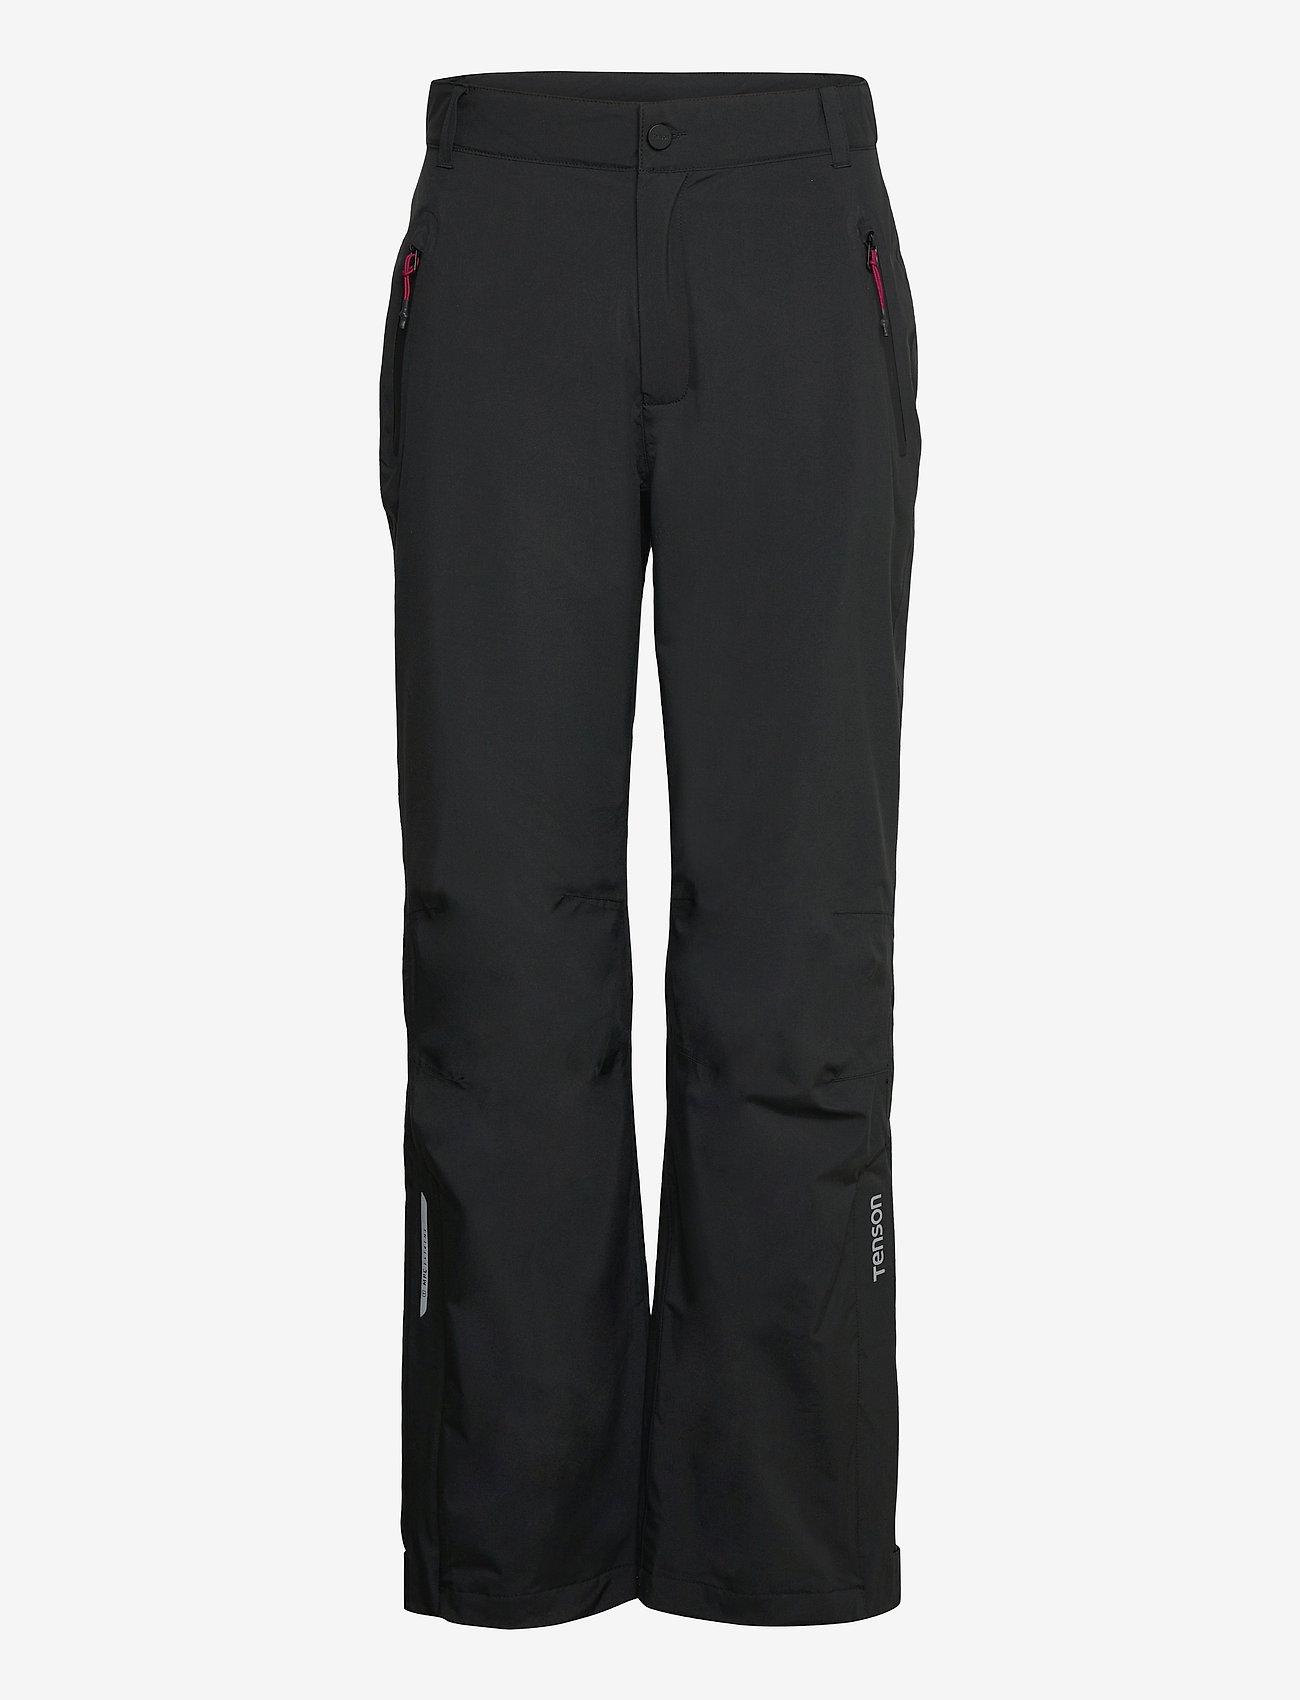 Tenson - BISCAYA EVO PANTS W - sportbroek - black - 0